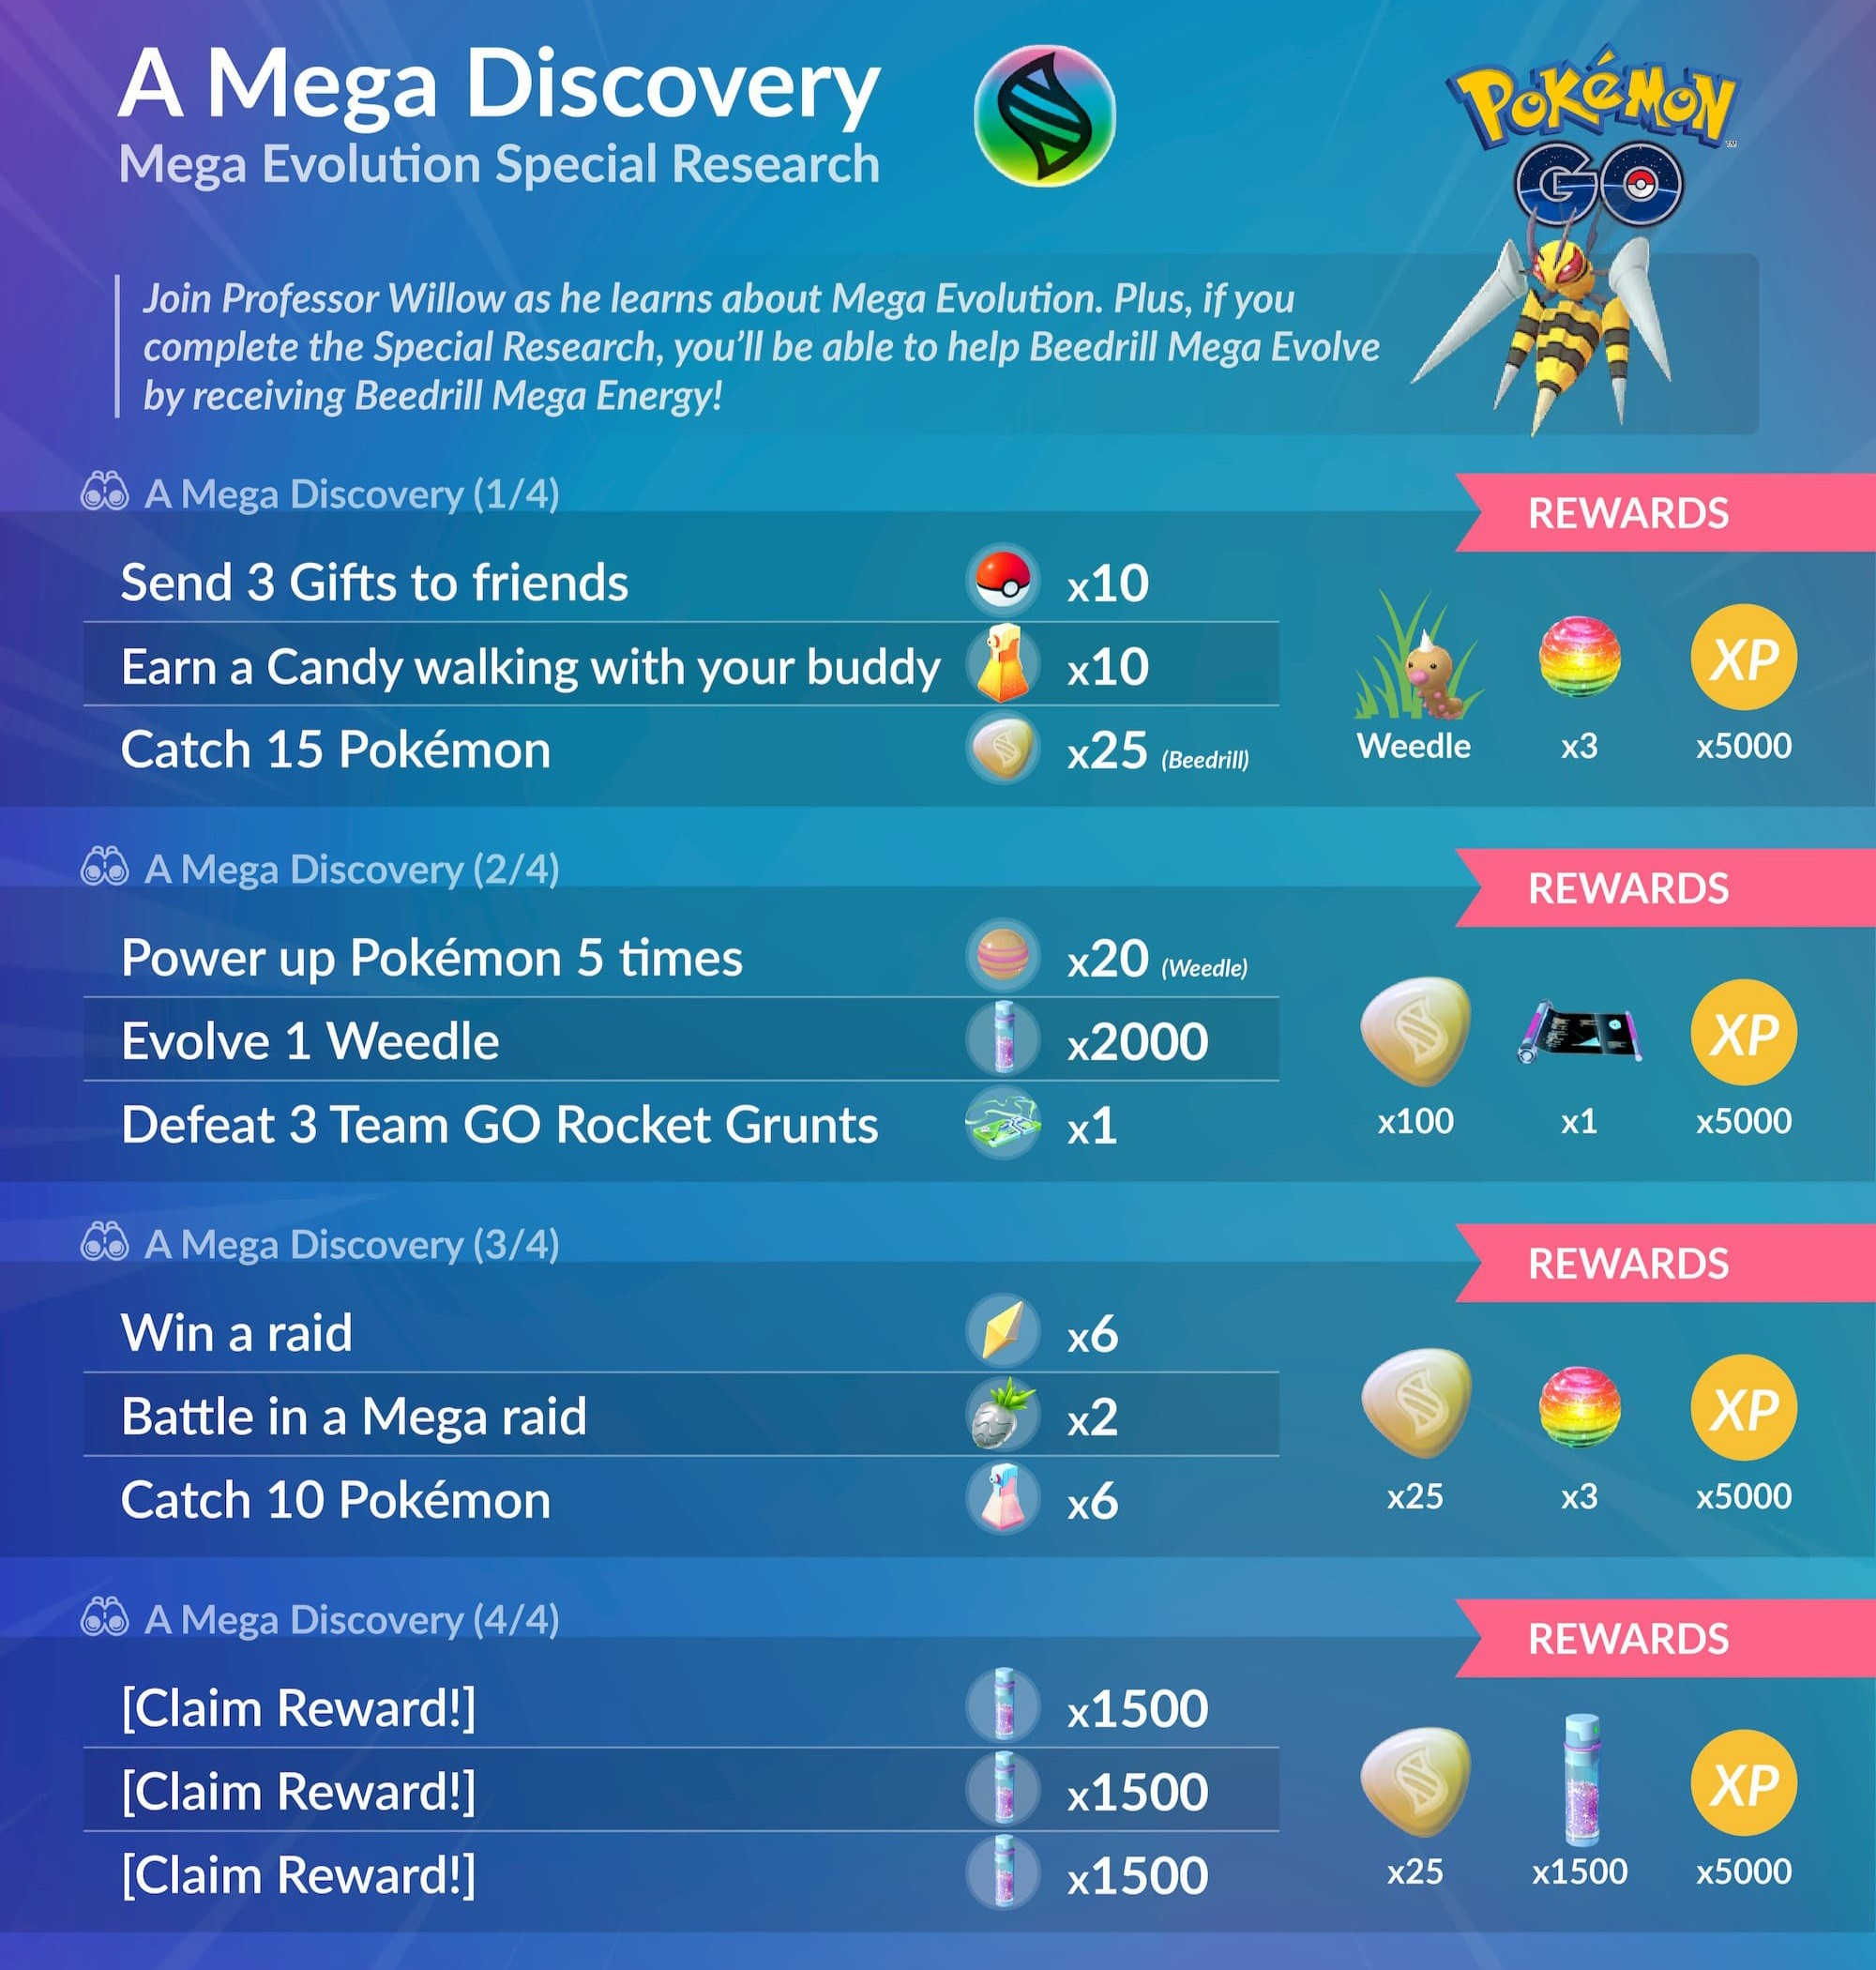 A Mega Discovery Tasks